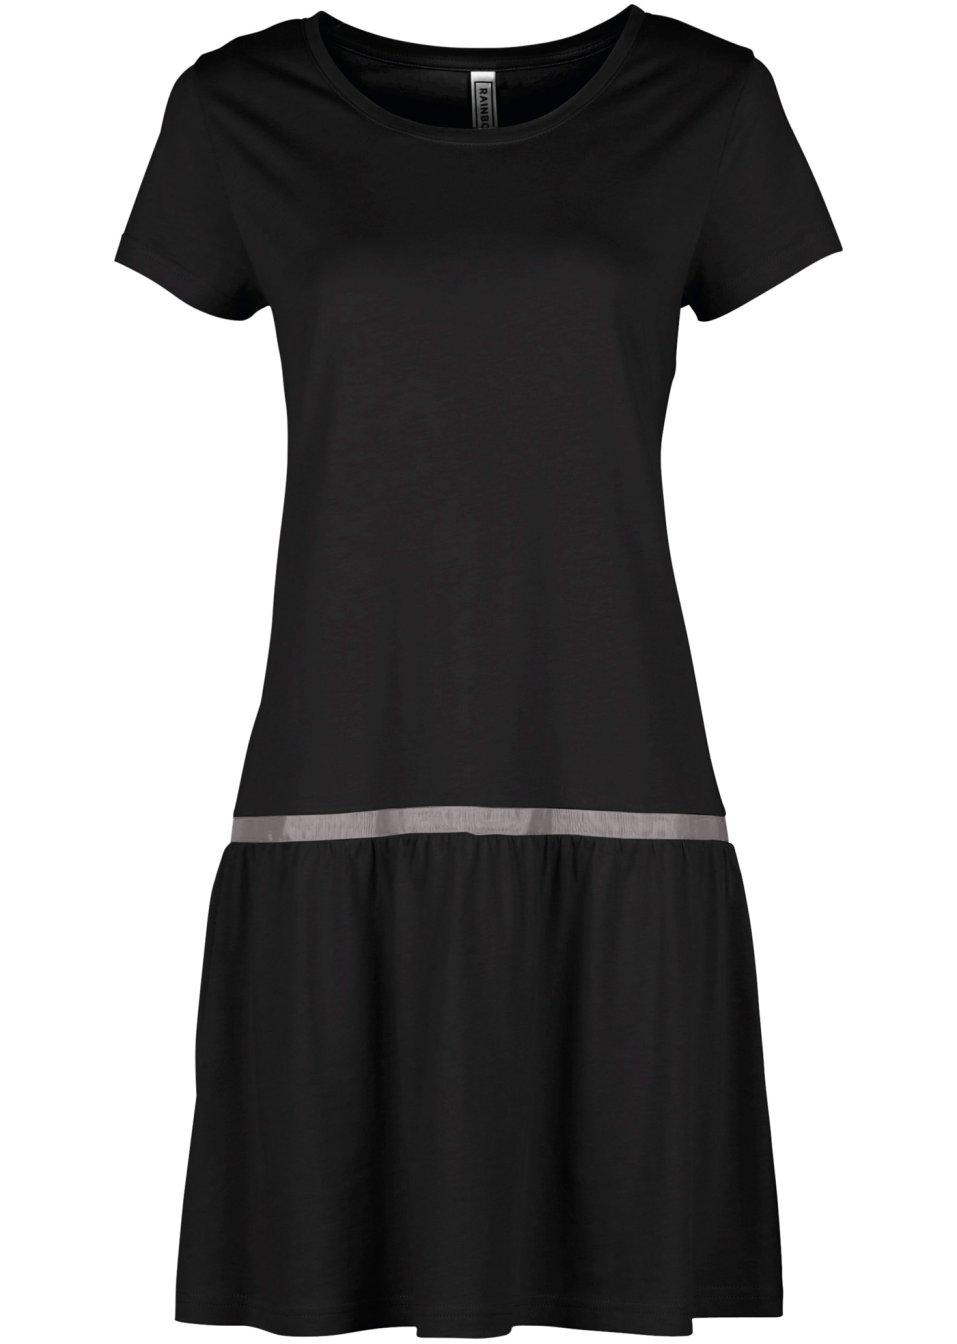 robe t shirt noir rainbow acheter online. Black Bedroom Furniture Sets. Home Design Ideas